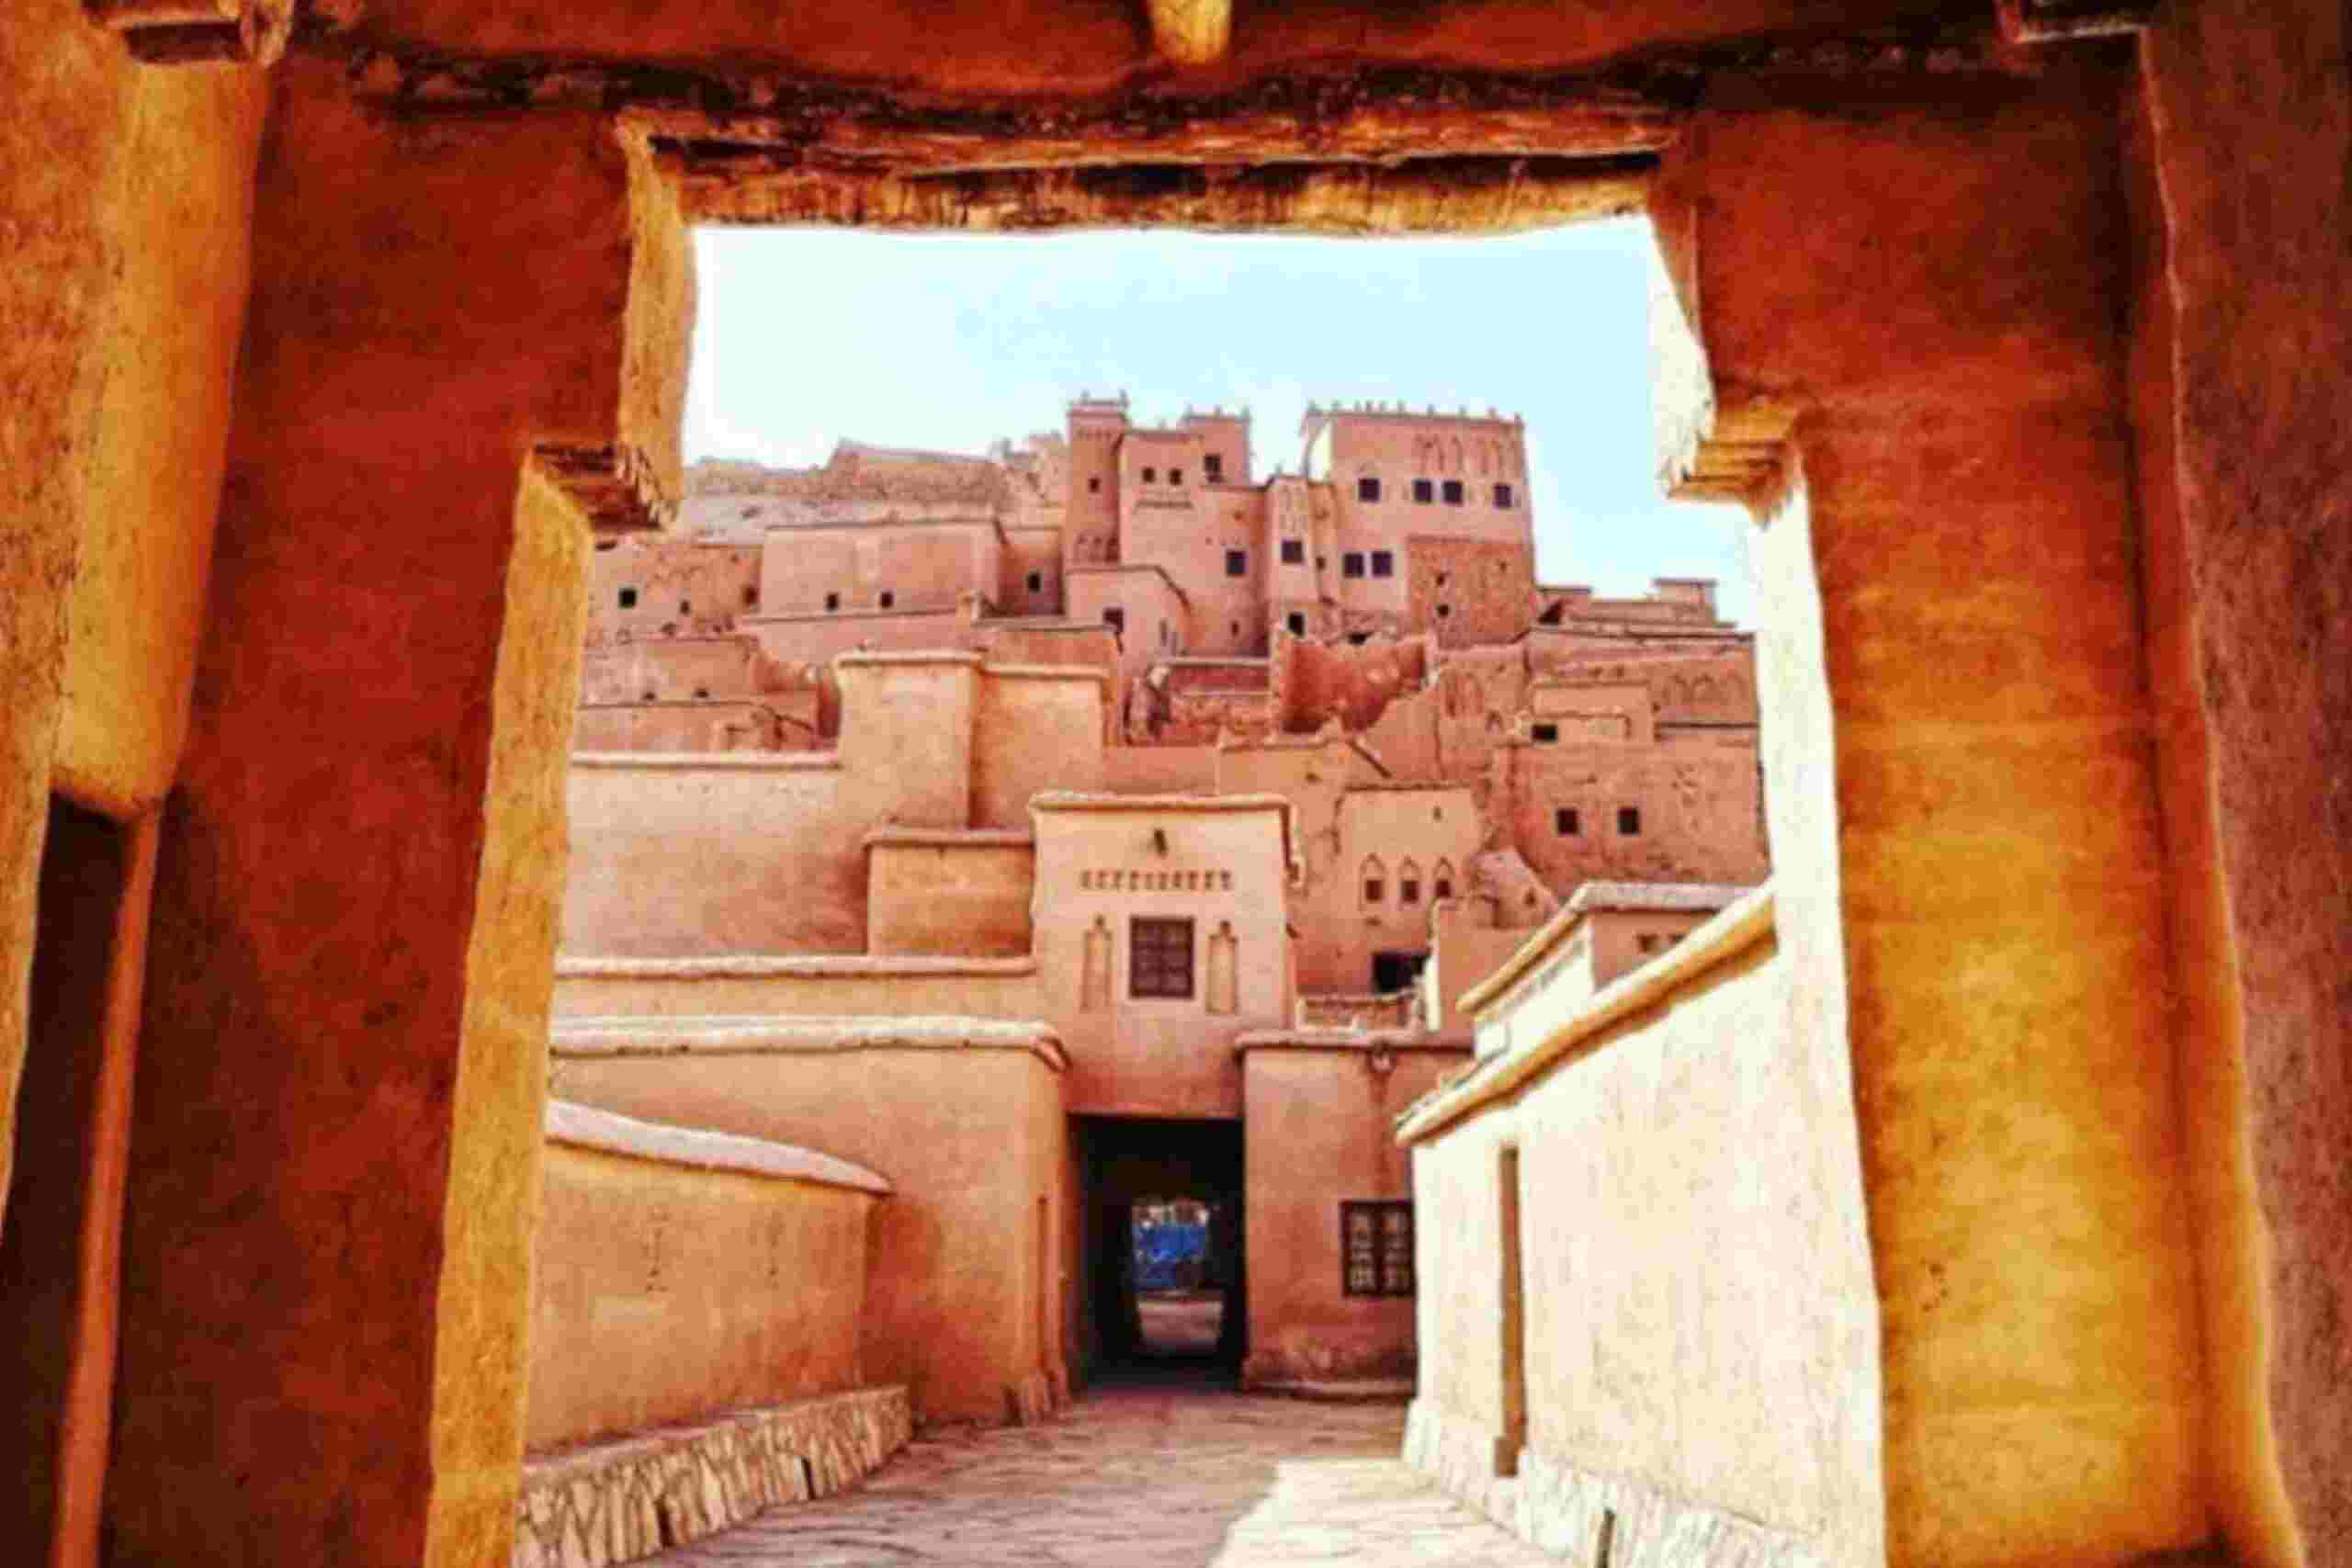 Ruta de 3 Días a Marrakech a través del Desierto de Marruecos